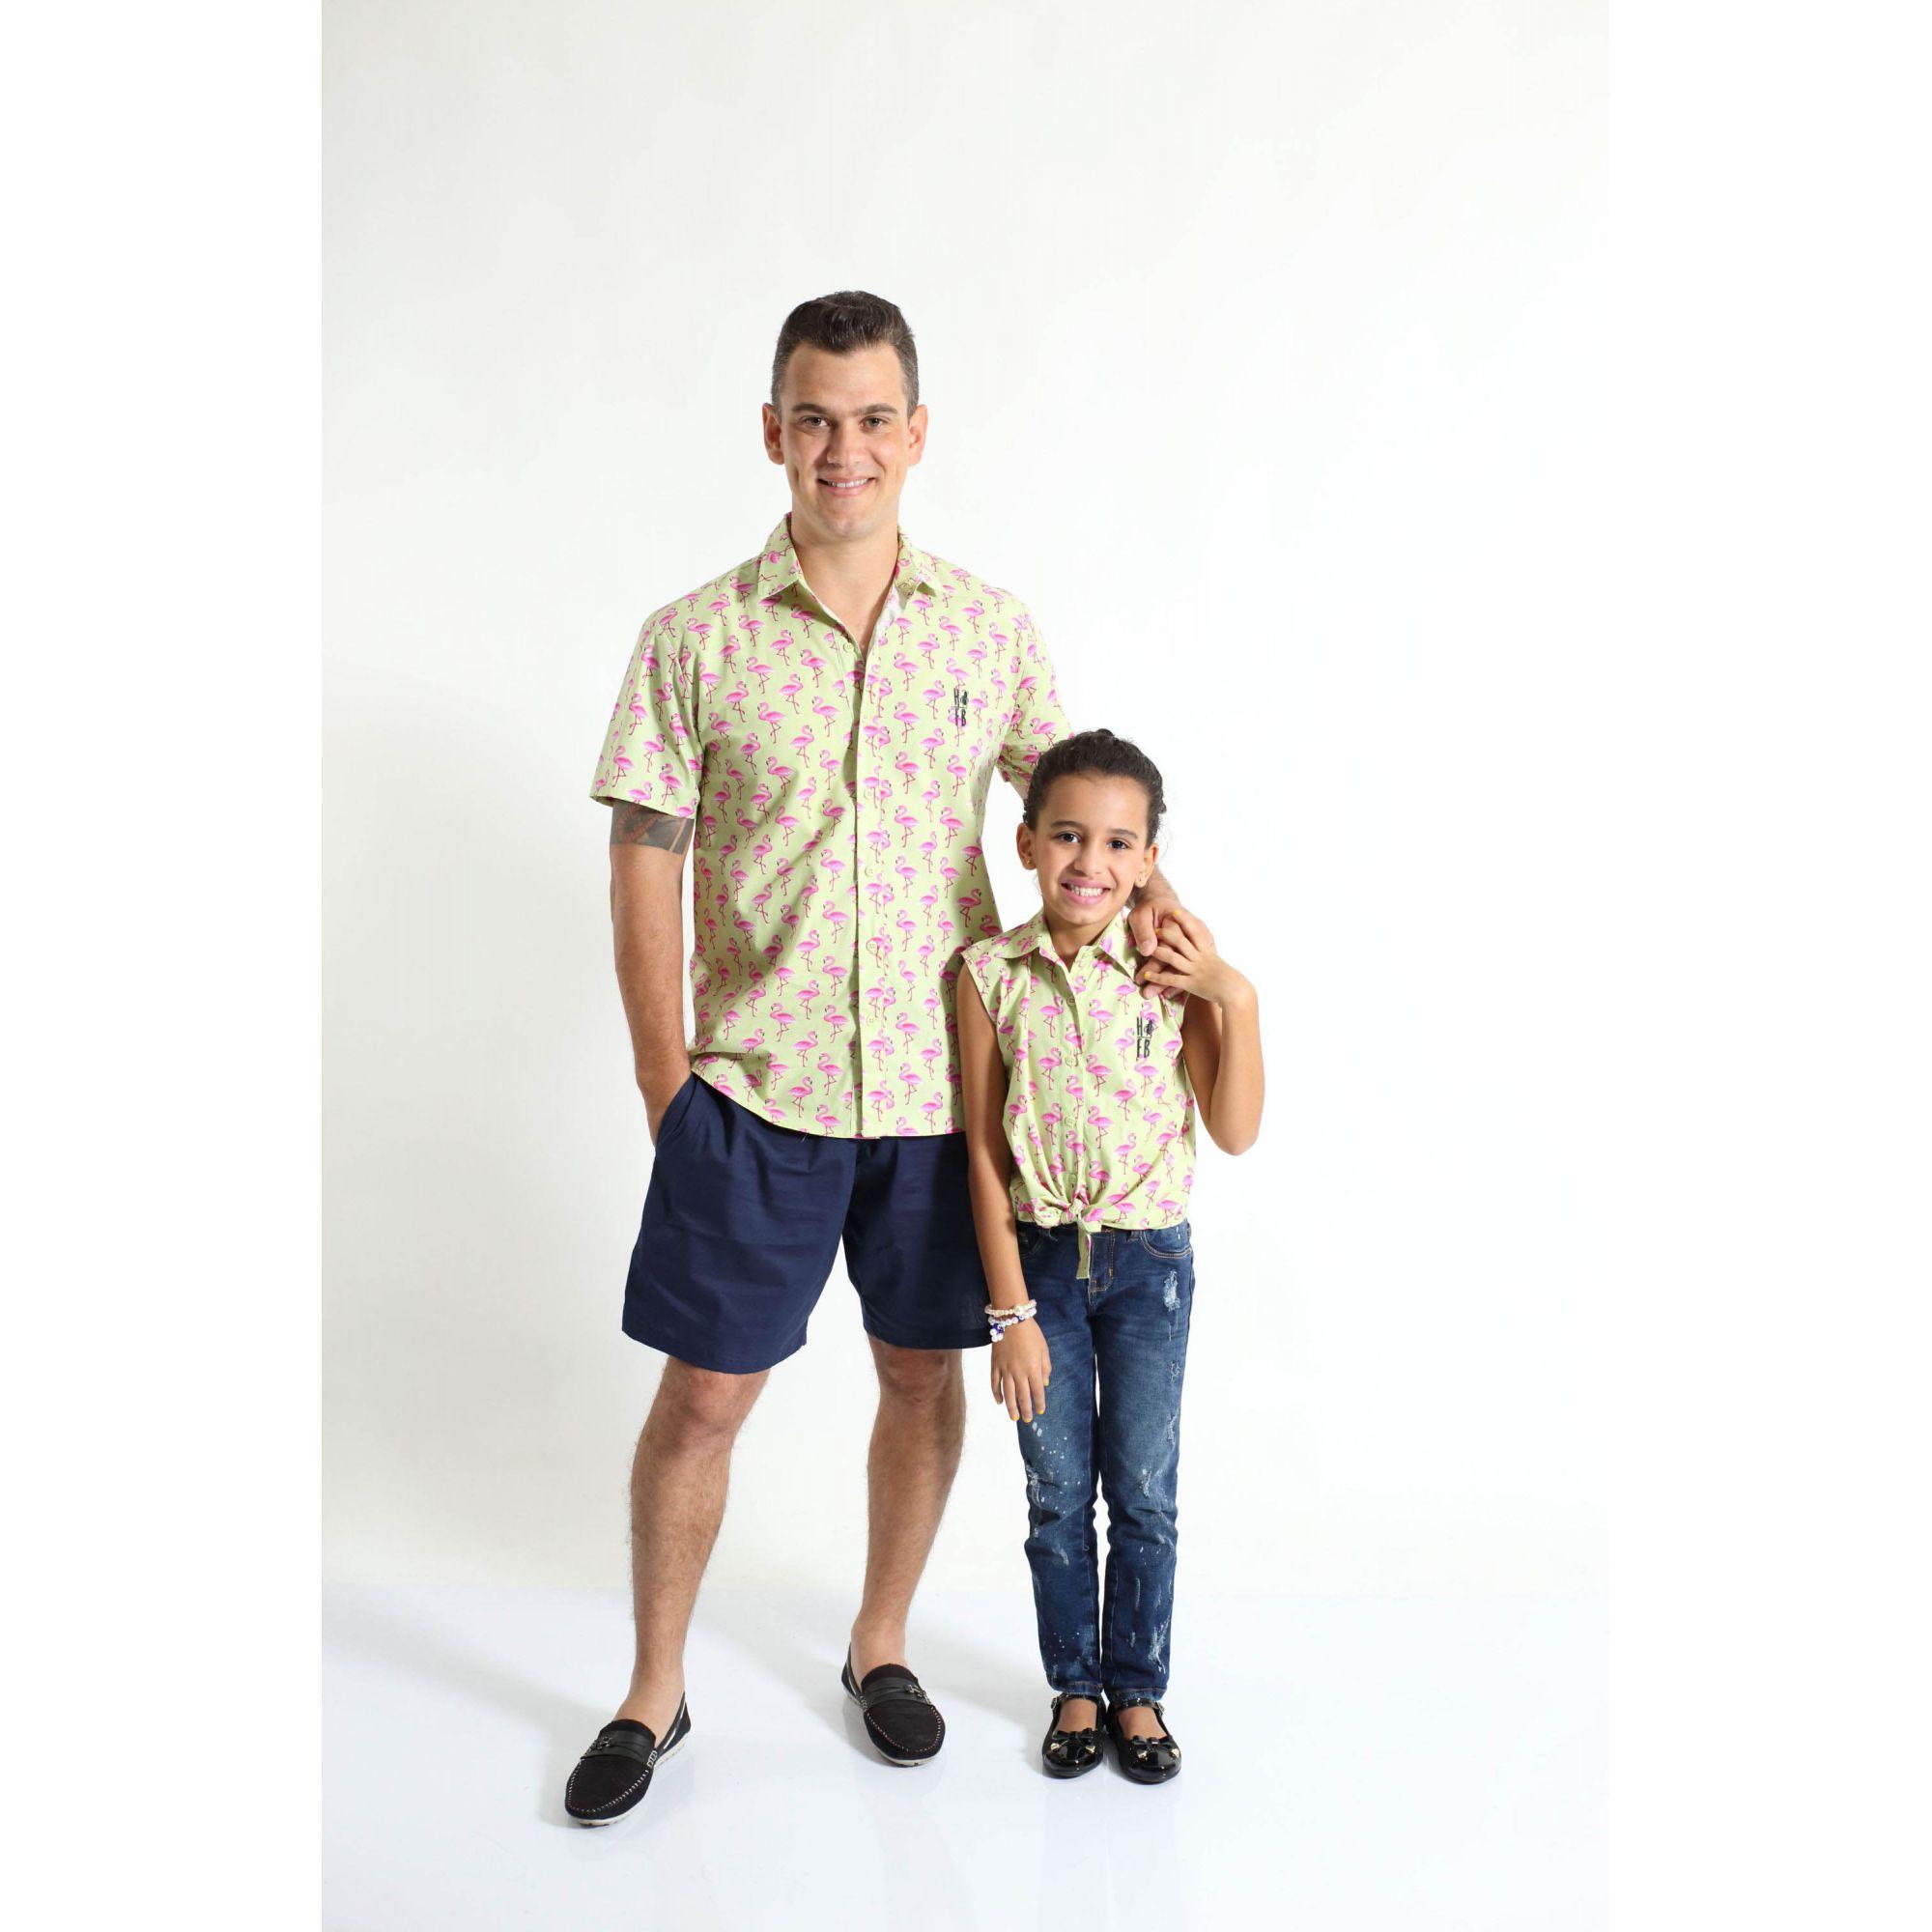 PAI E FILHA > Kit 02 Camisas Manga Curta Flamingo [Coleção Tal Pai Tal Filha]  - Heitor Fashion Brazil